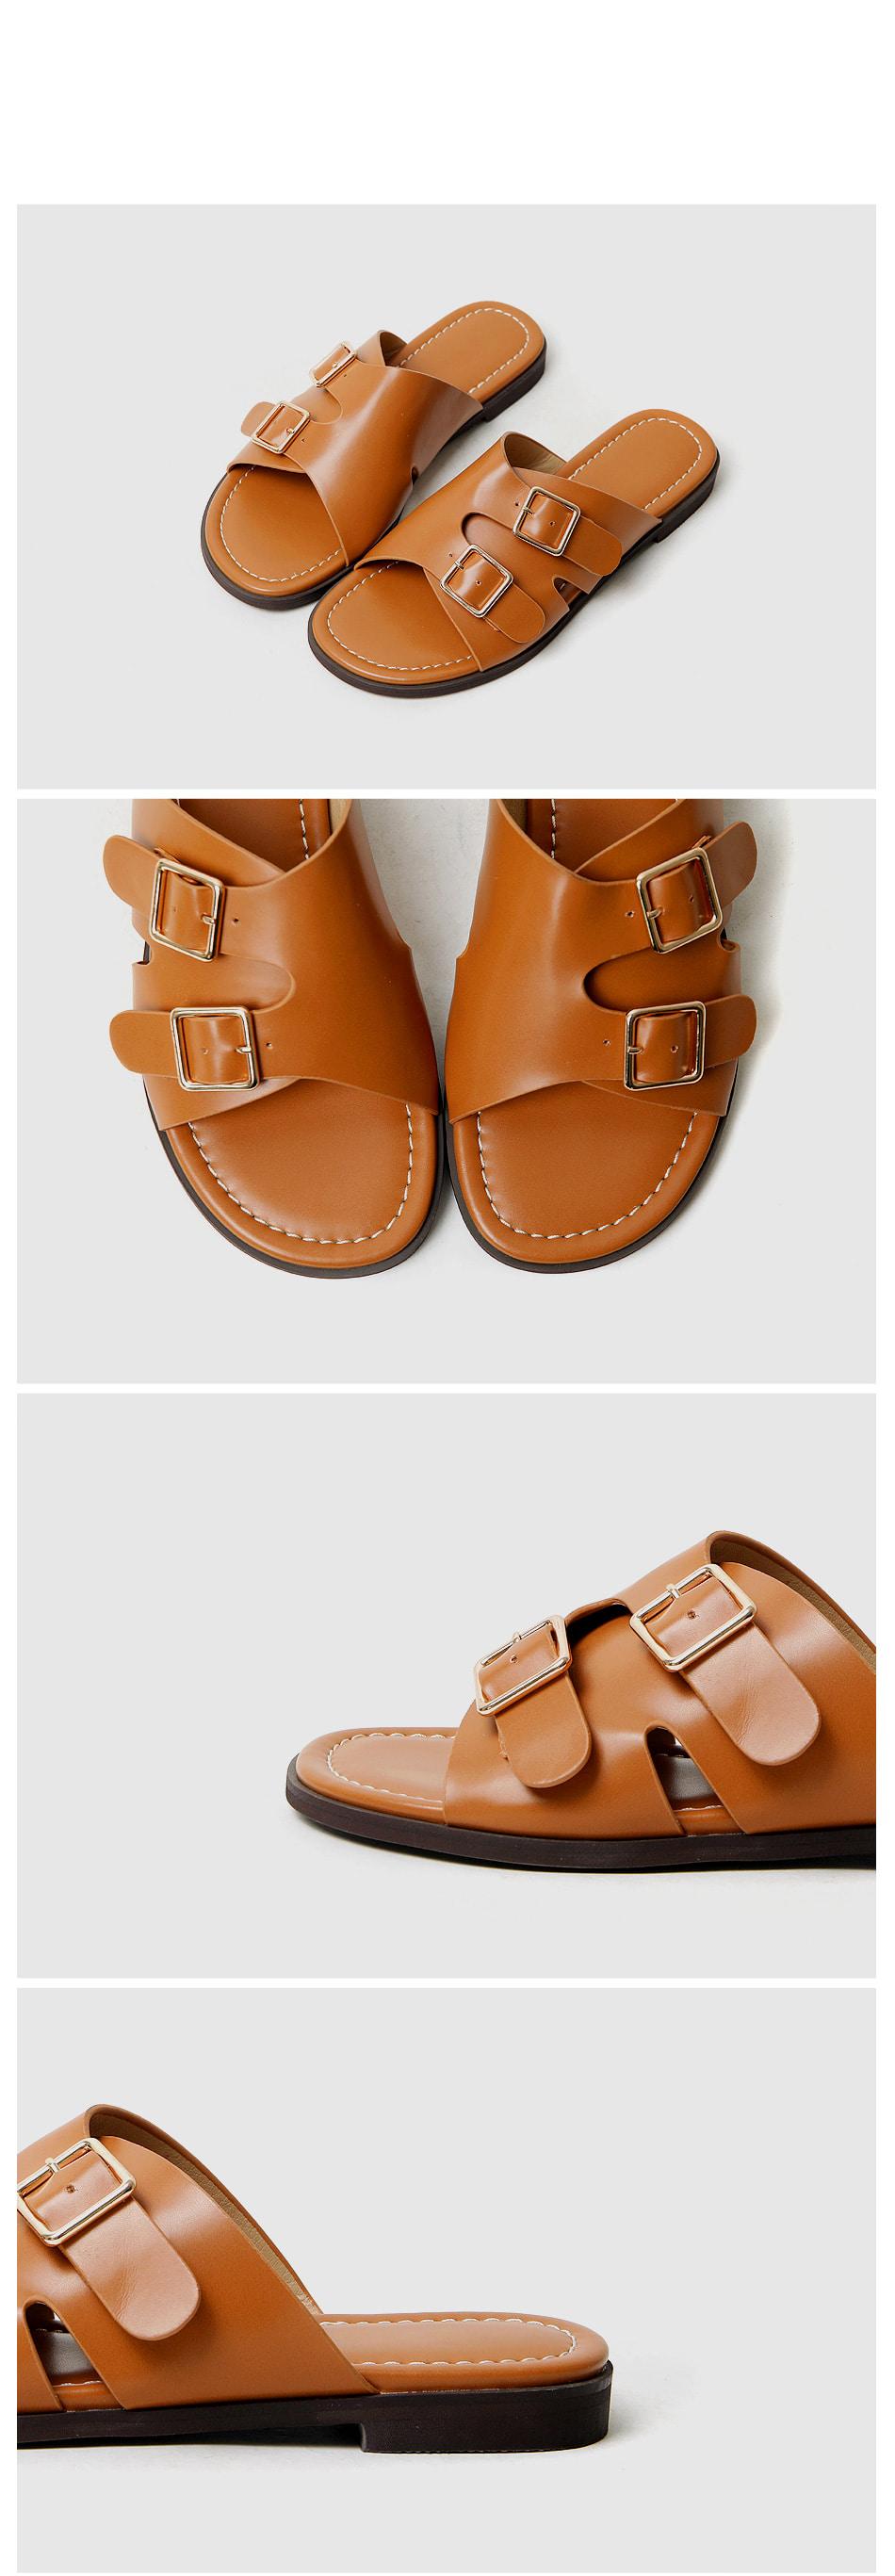 Daeb slippers 1 cm